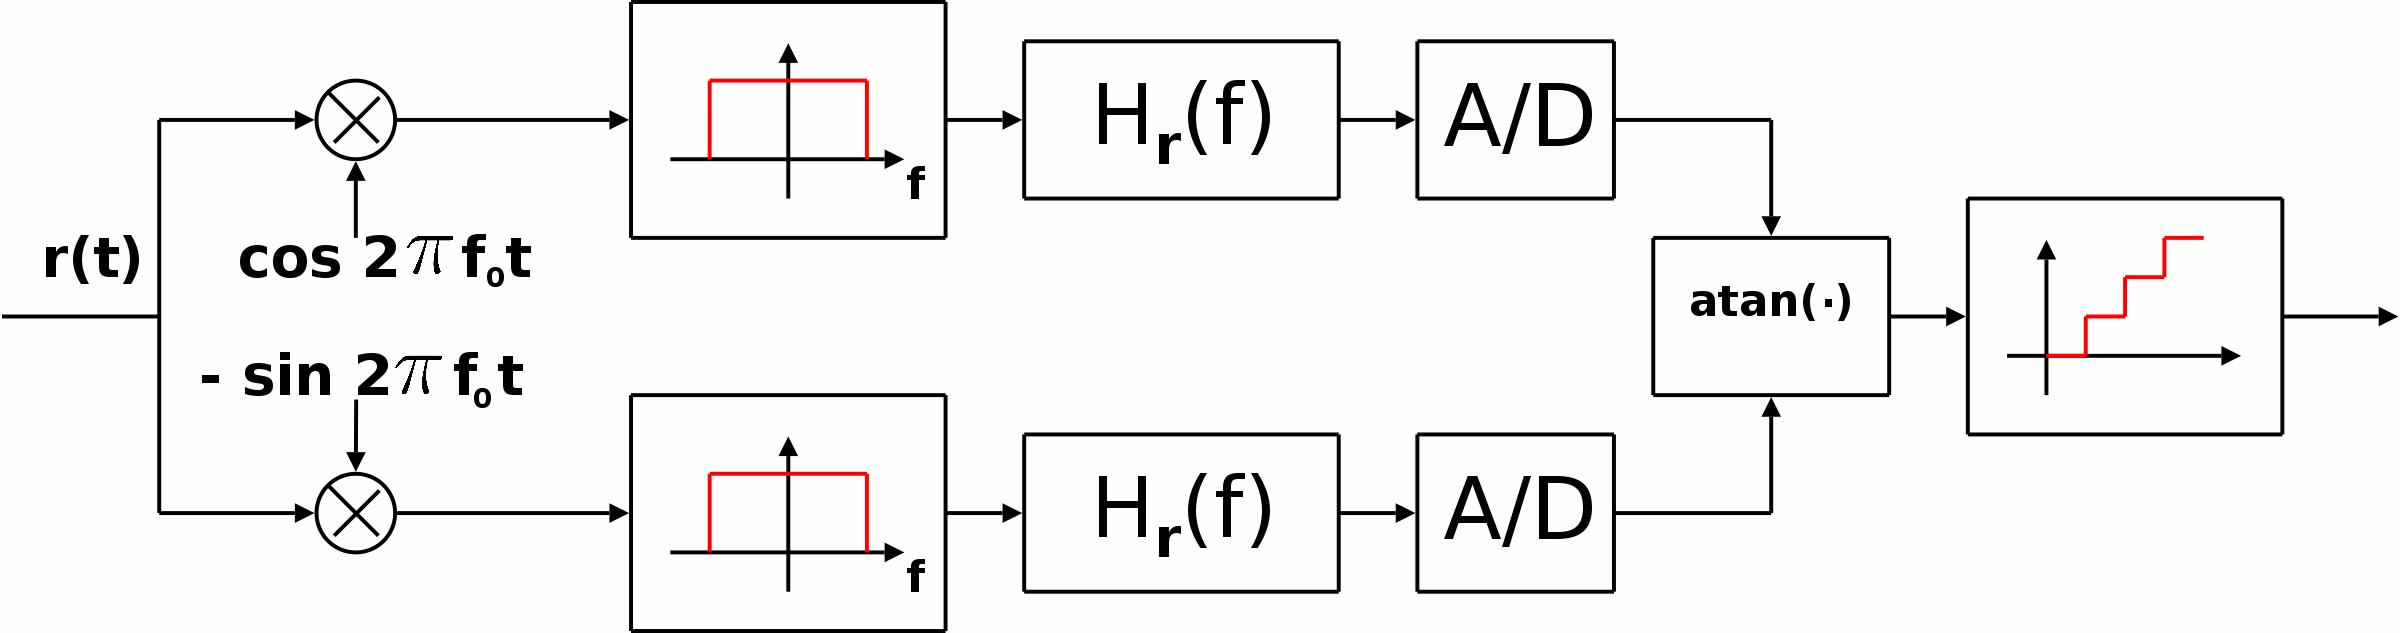 File Psk Receiver Diagram Png